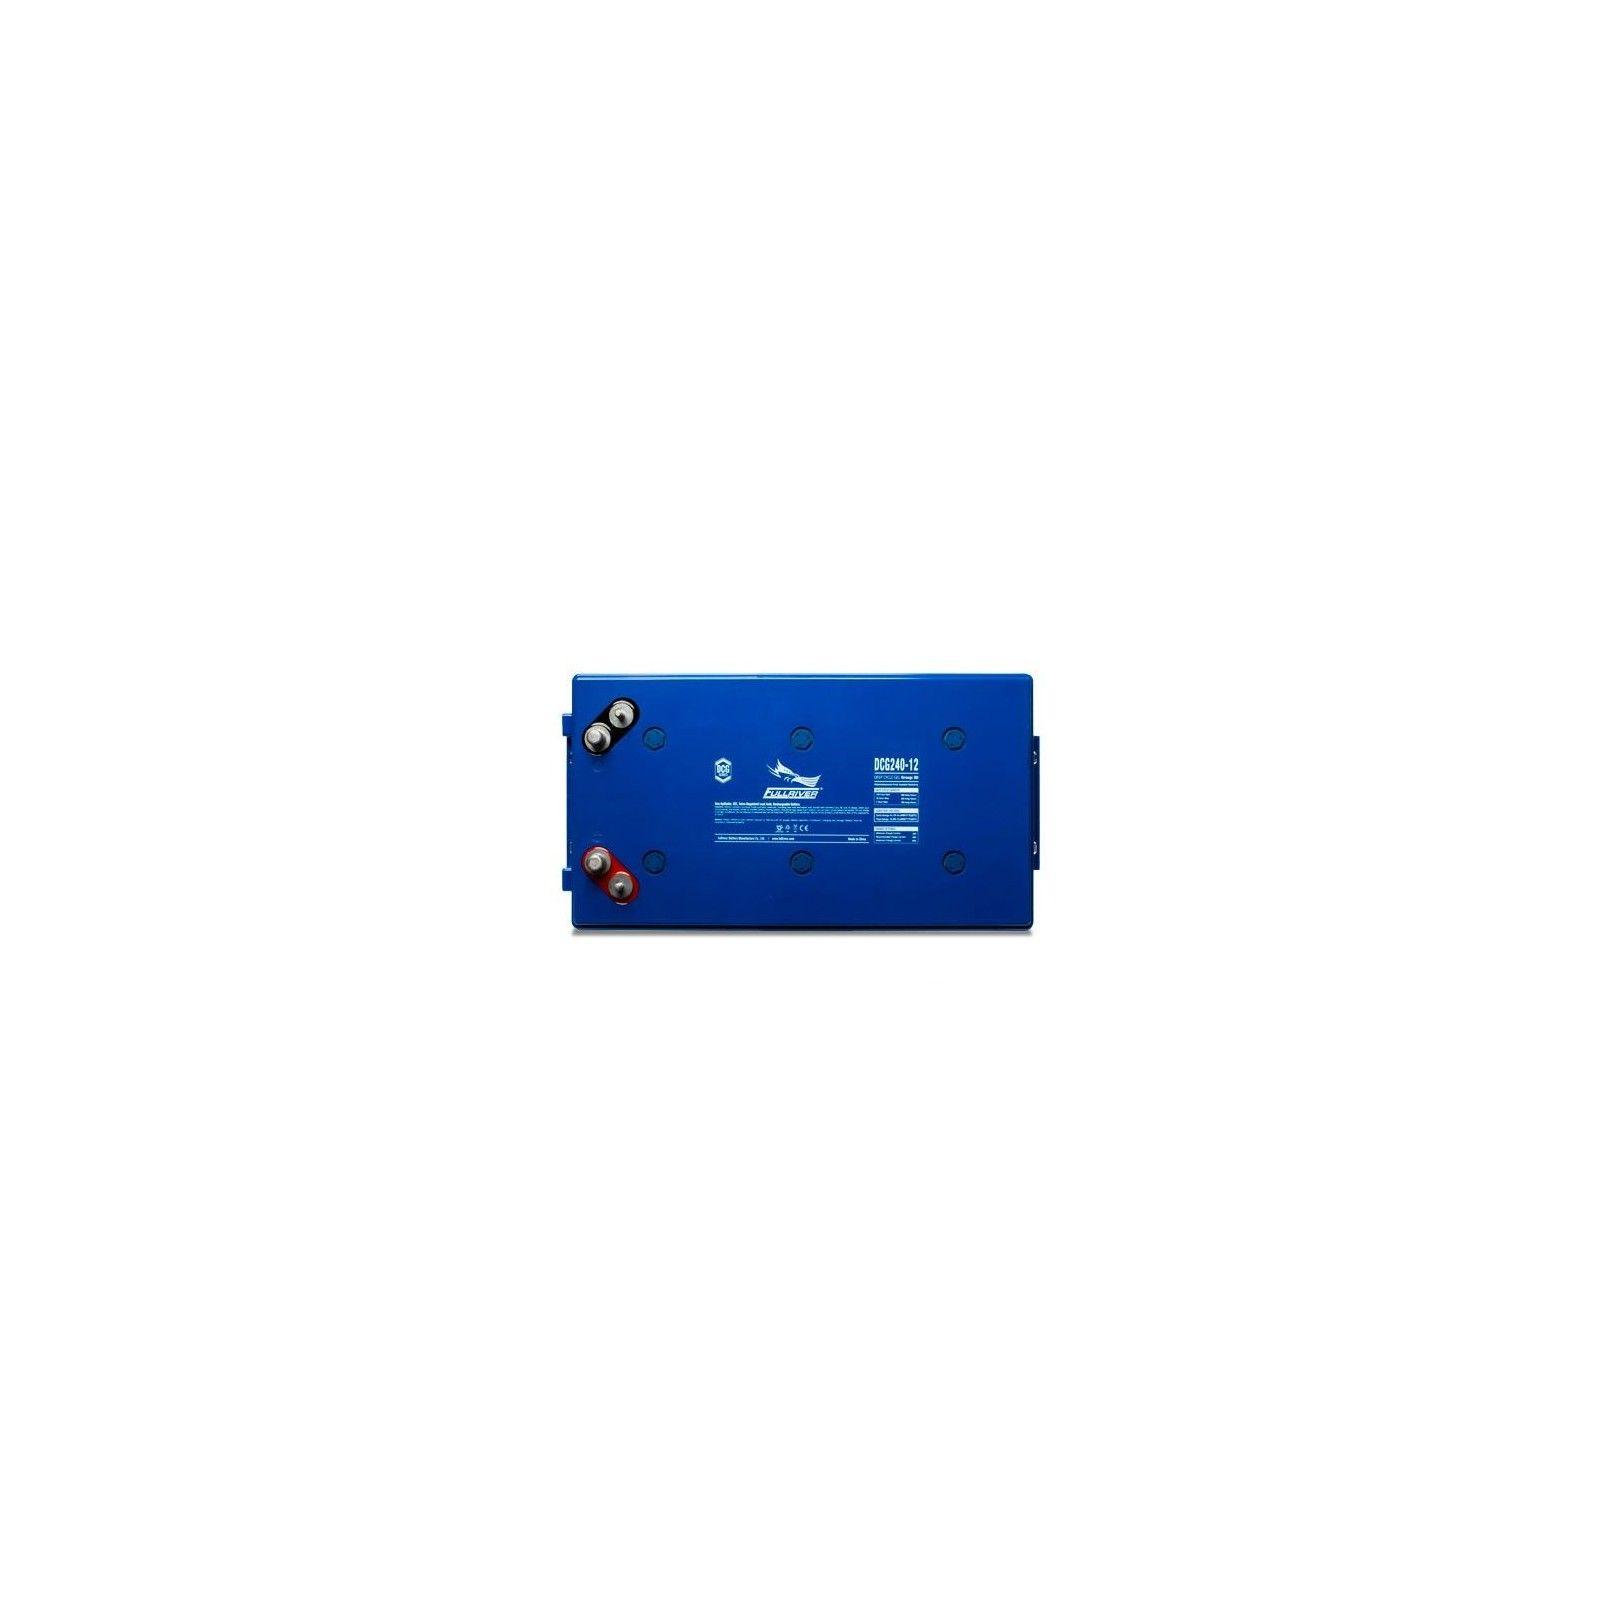 BATERIA Fullriver FULLRIVER DCG240-12 240Ah 12V FULLRIVER - 1